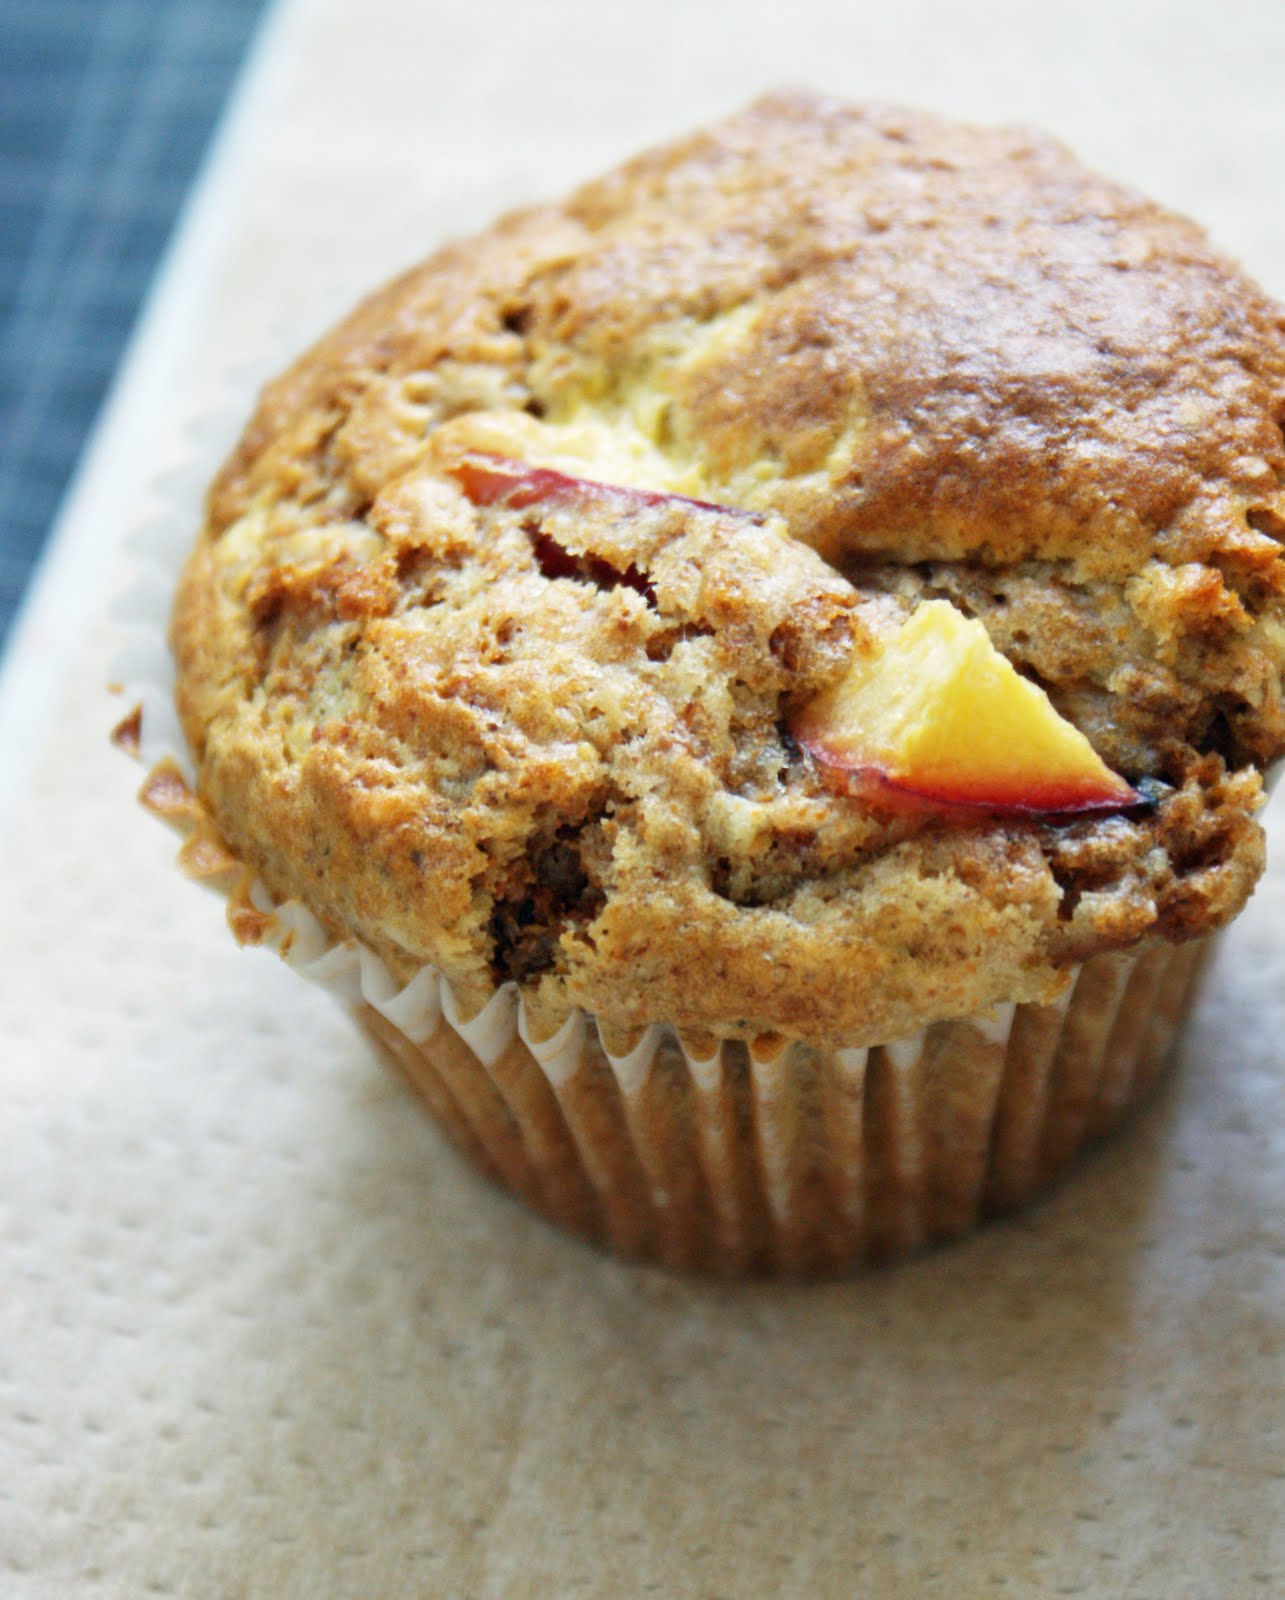 Peach+bran+muffins